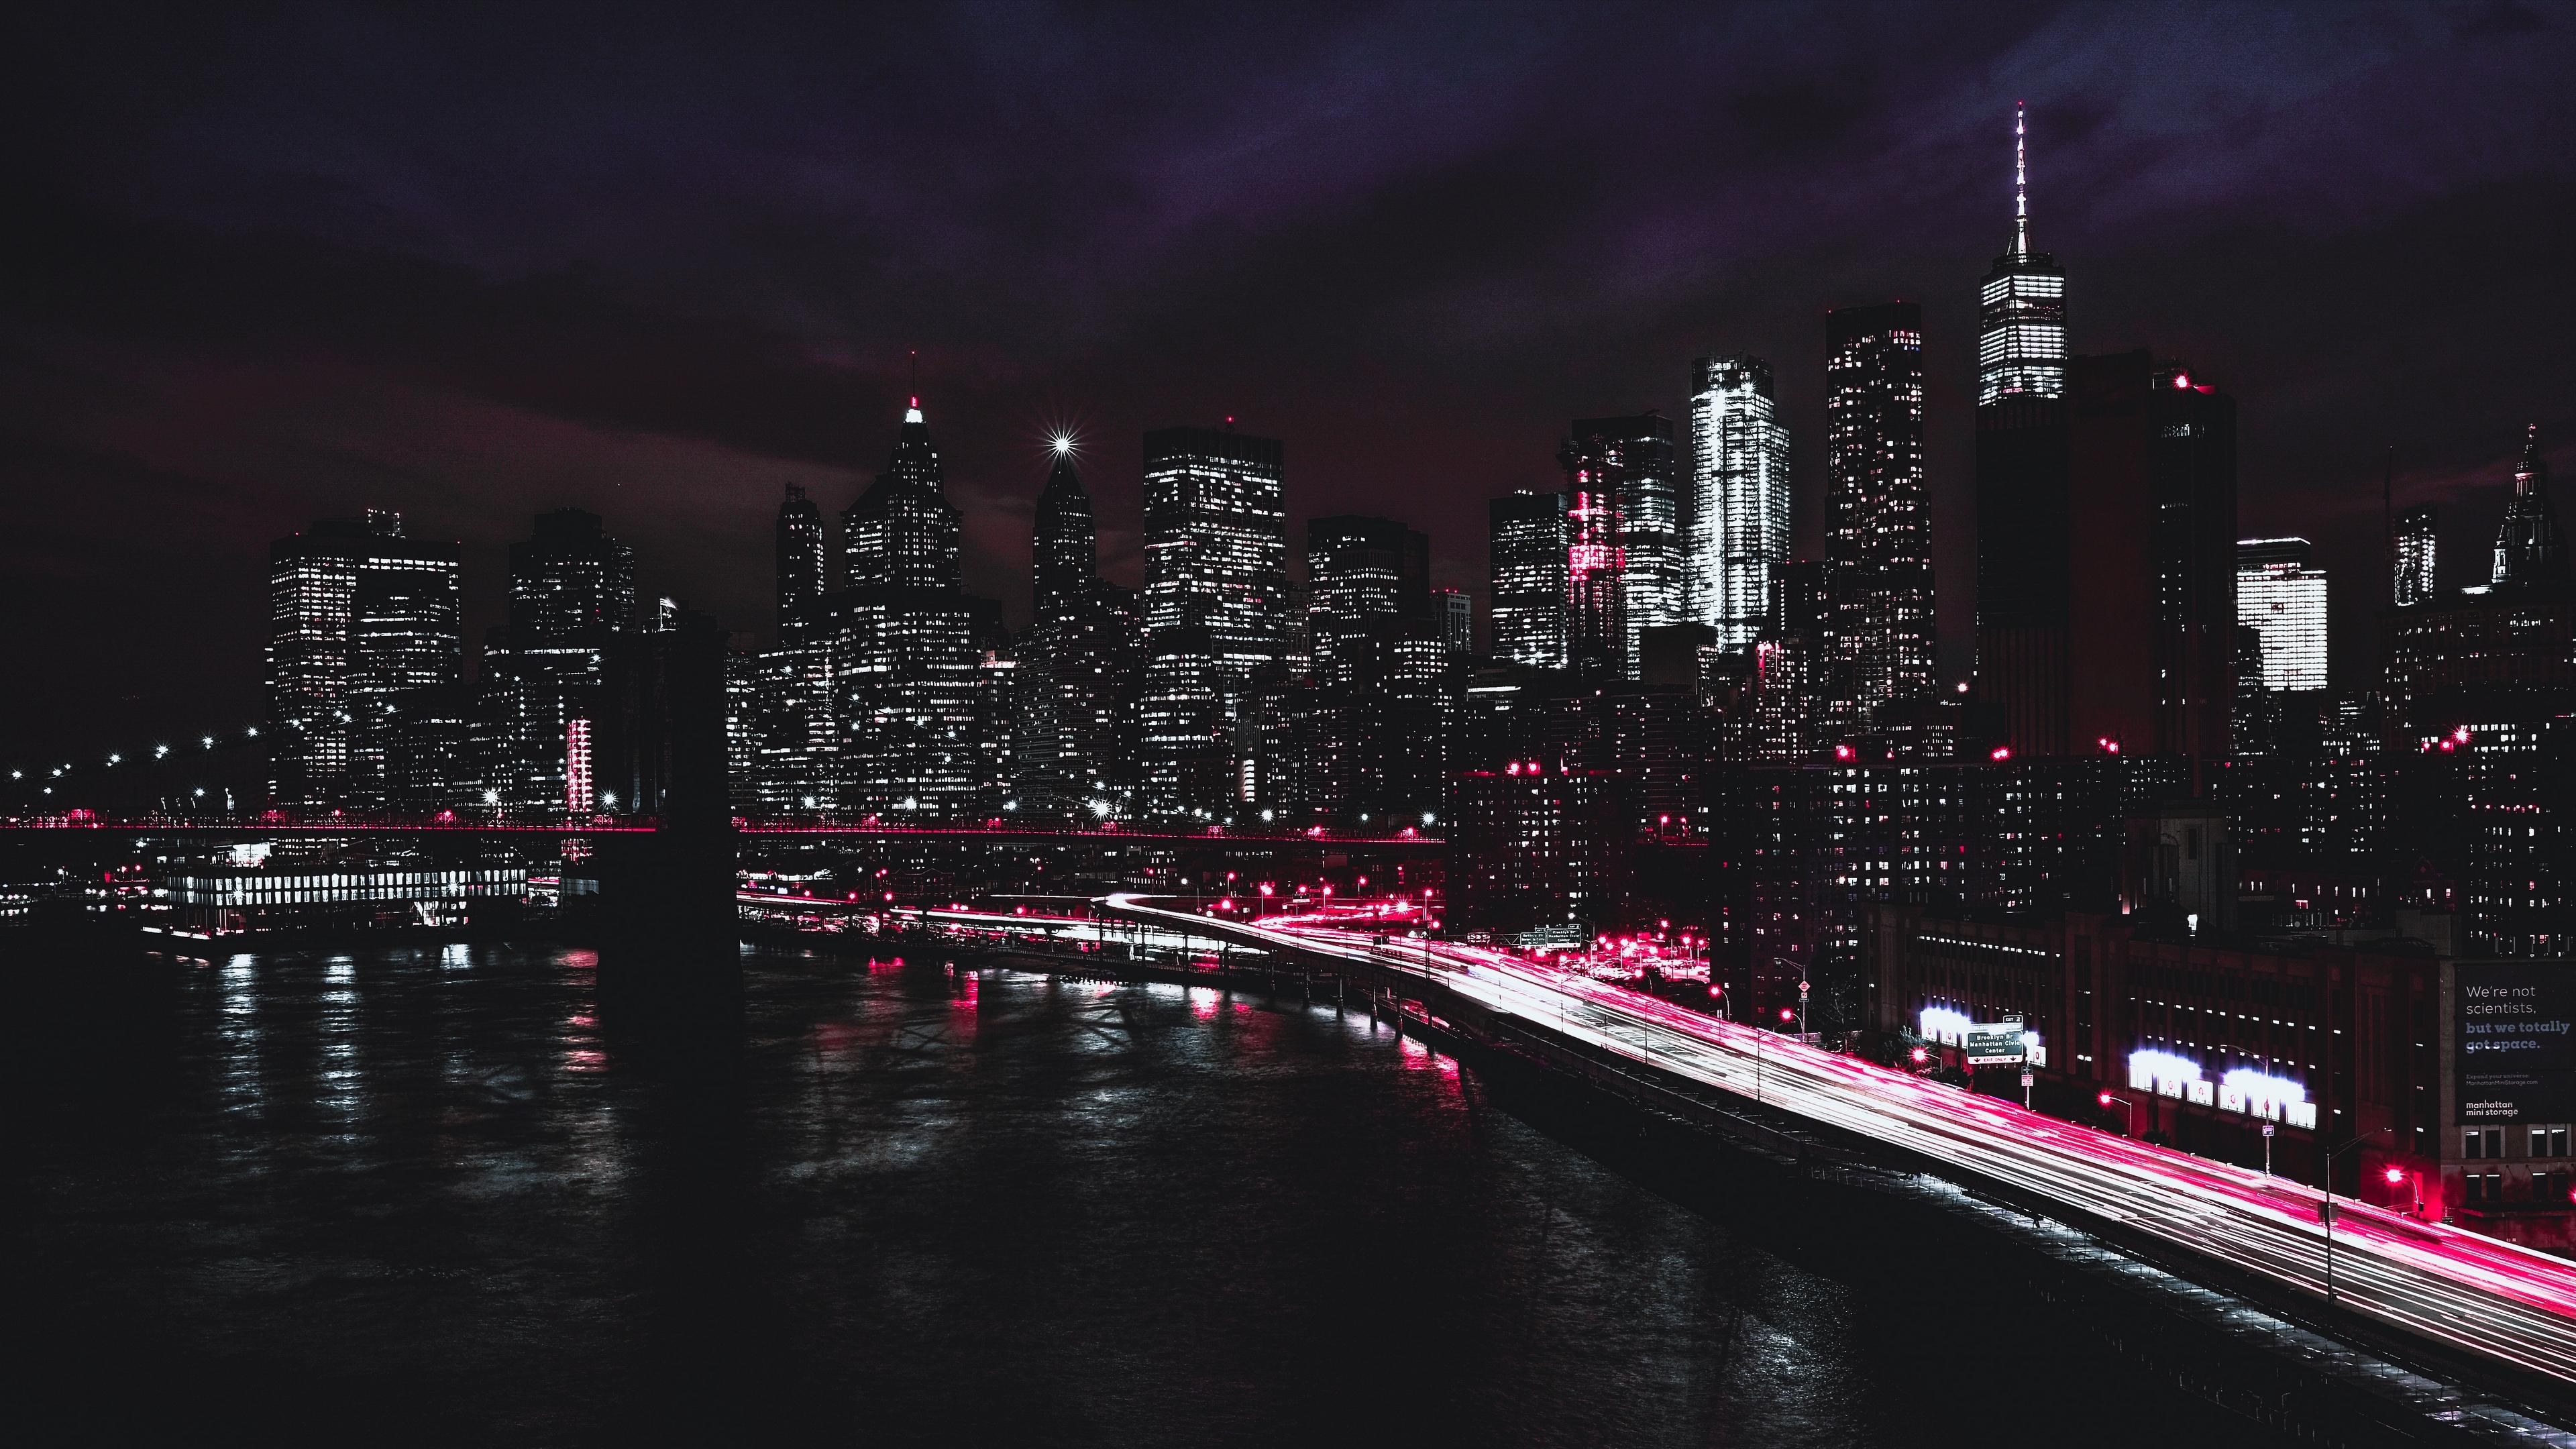 new york usa night skyscrapers 4k 1538068860 - new york, usa, night, skyscrapers 4k - USA, Night, new york